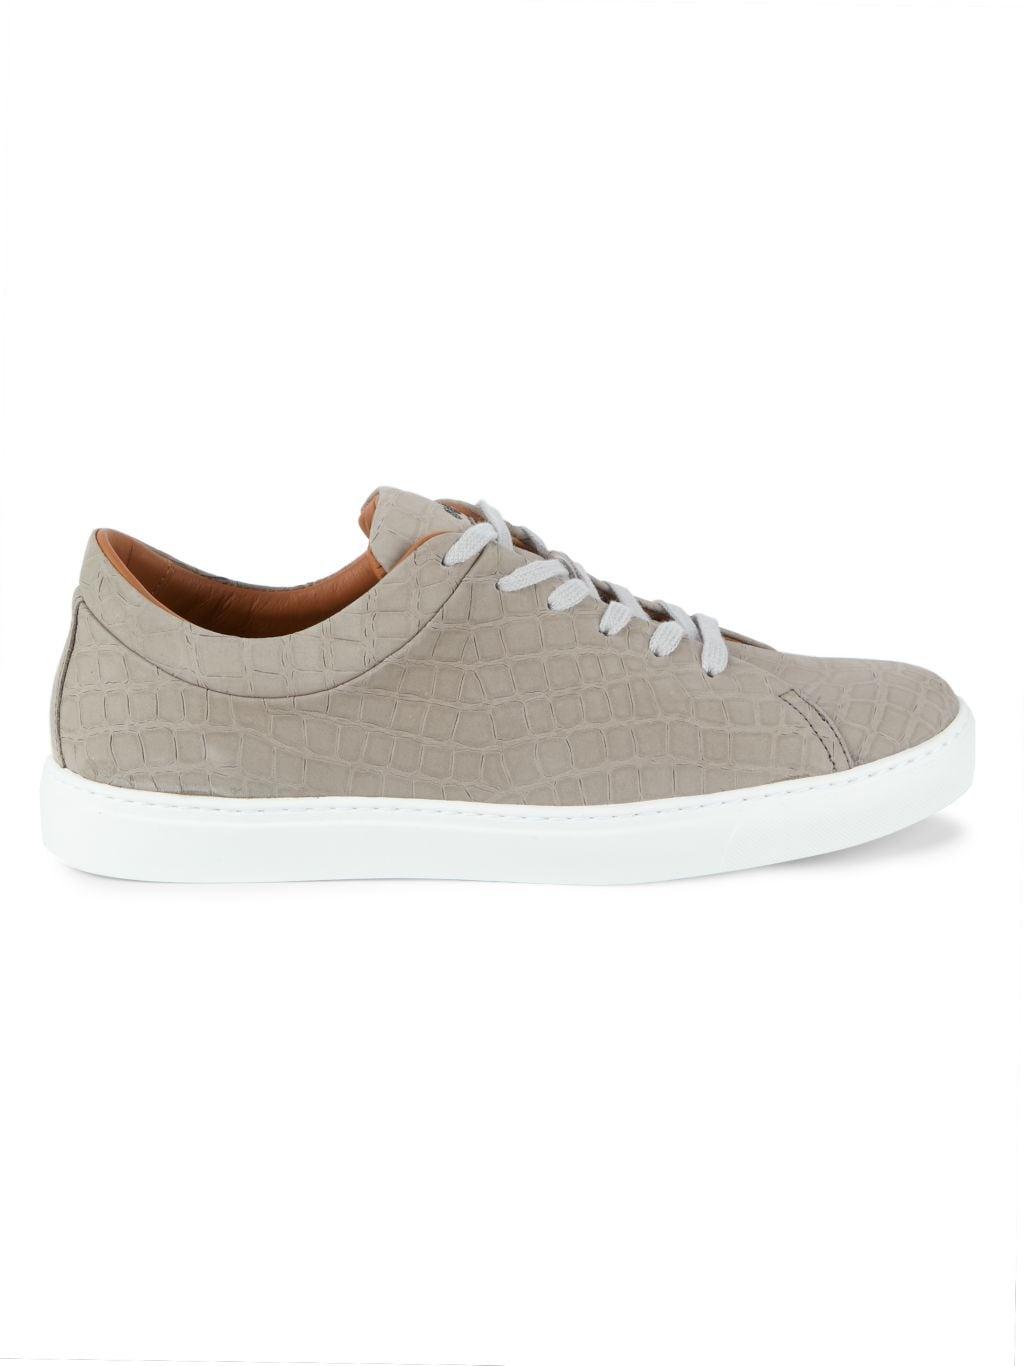 Aquatalia Alaric Crocodile-Embossed Leather Low-Top Sneakers